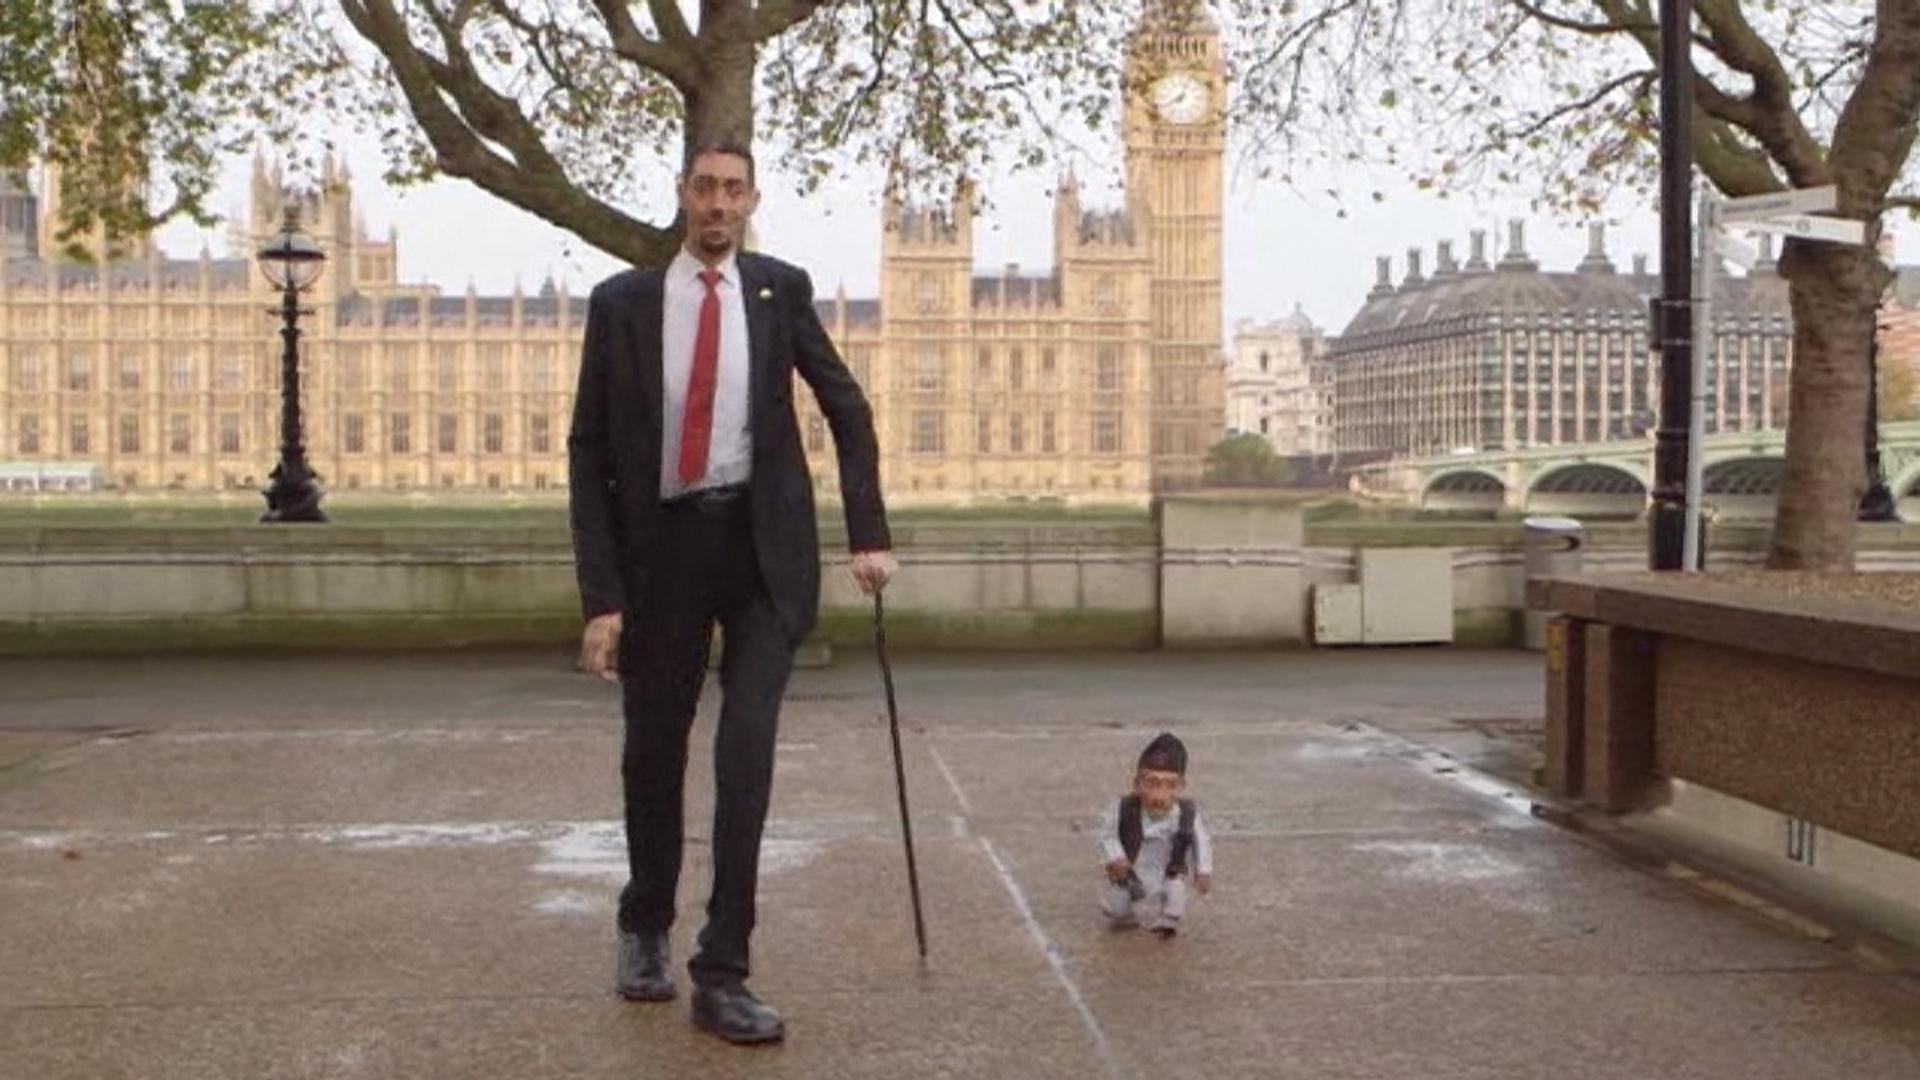 World S Tallest And Shortest Men Meet In London